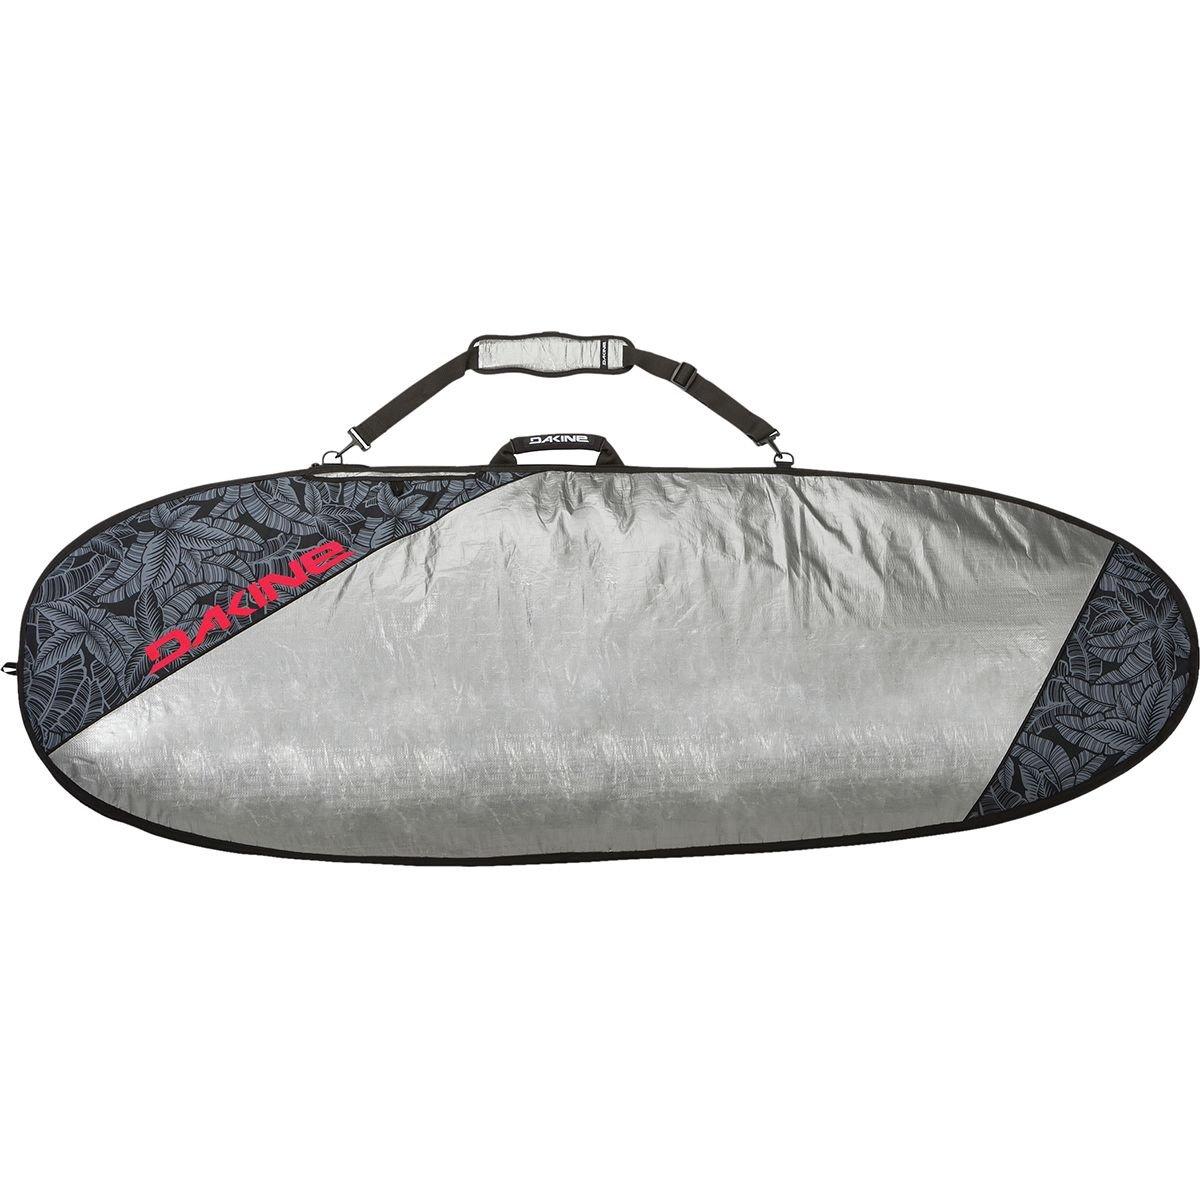 Dakine Unisex Daylight 6'6'' Hybrid Surfboard Bag, Stencil Palm, One Size